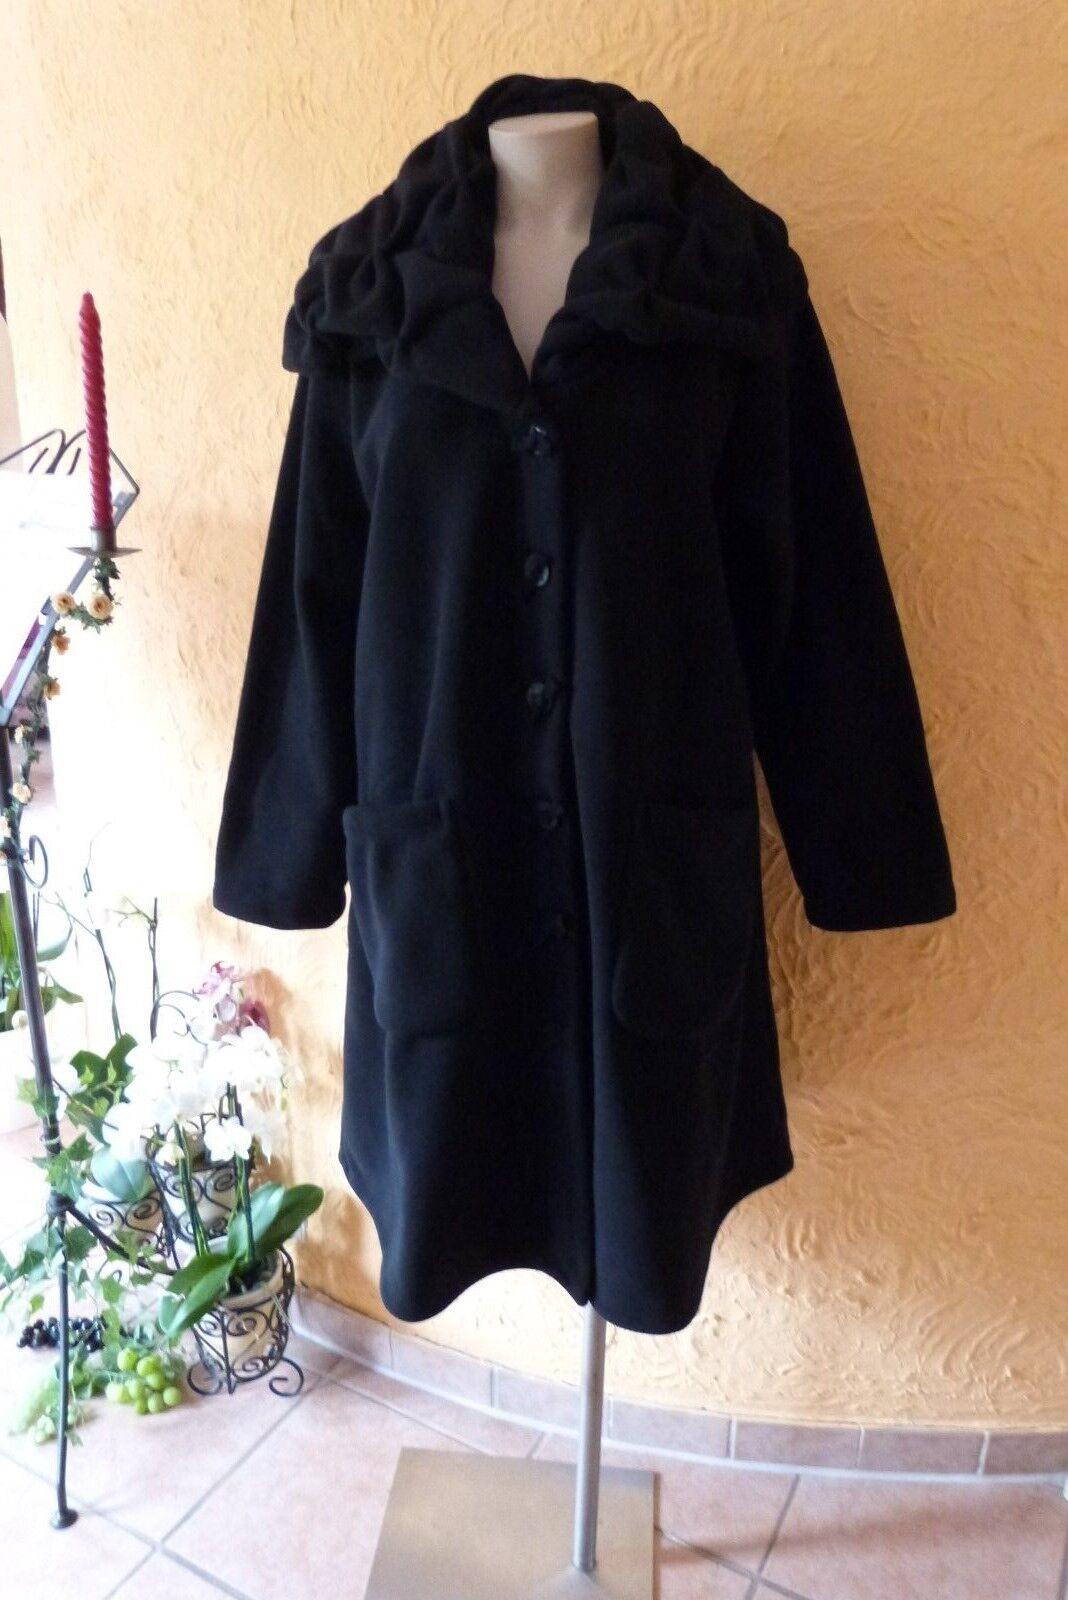 BORIS INDUSTRIES Fleece Mantel EDEL Smok-Kragen 48 50 EG NEU  black LAGENLOOK